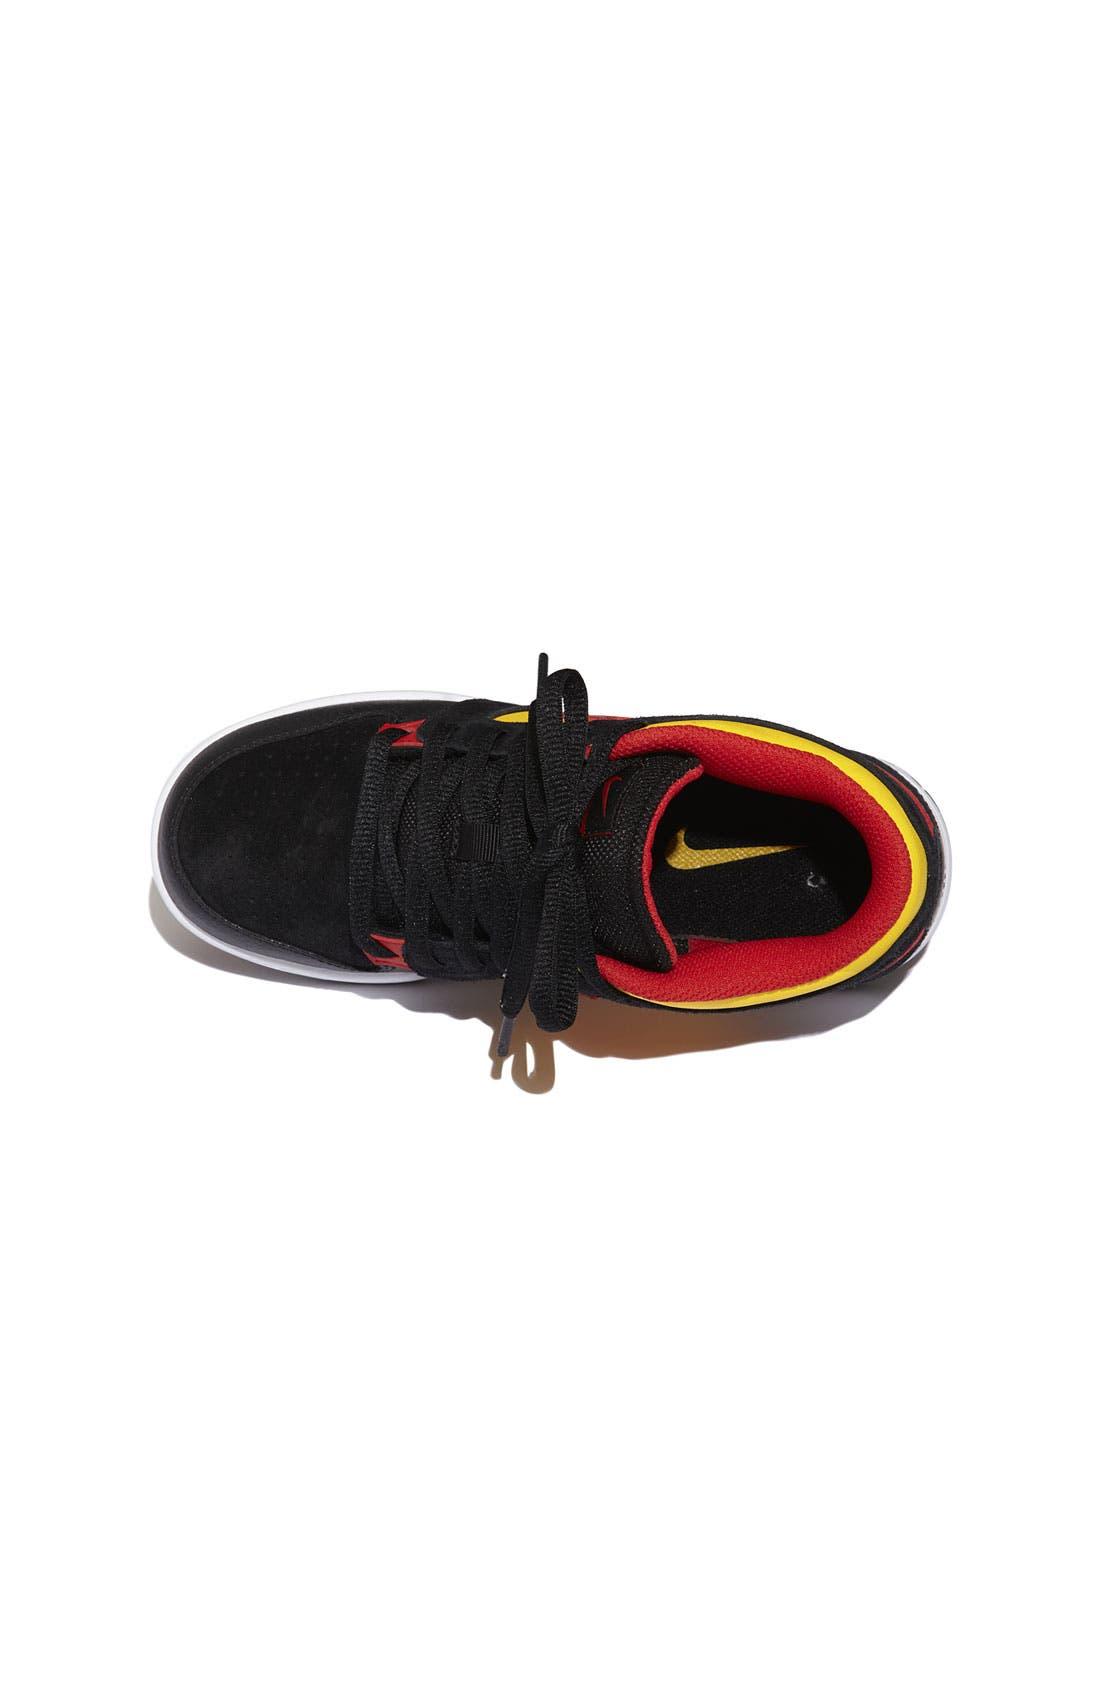 Alternate Image 3  - Nike 'Mogan 3' Sneaker (Toddler, Little Kid & Big Kid)